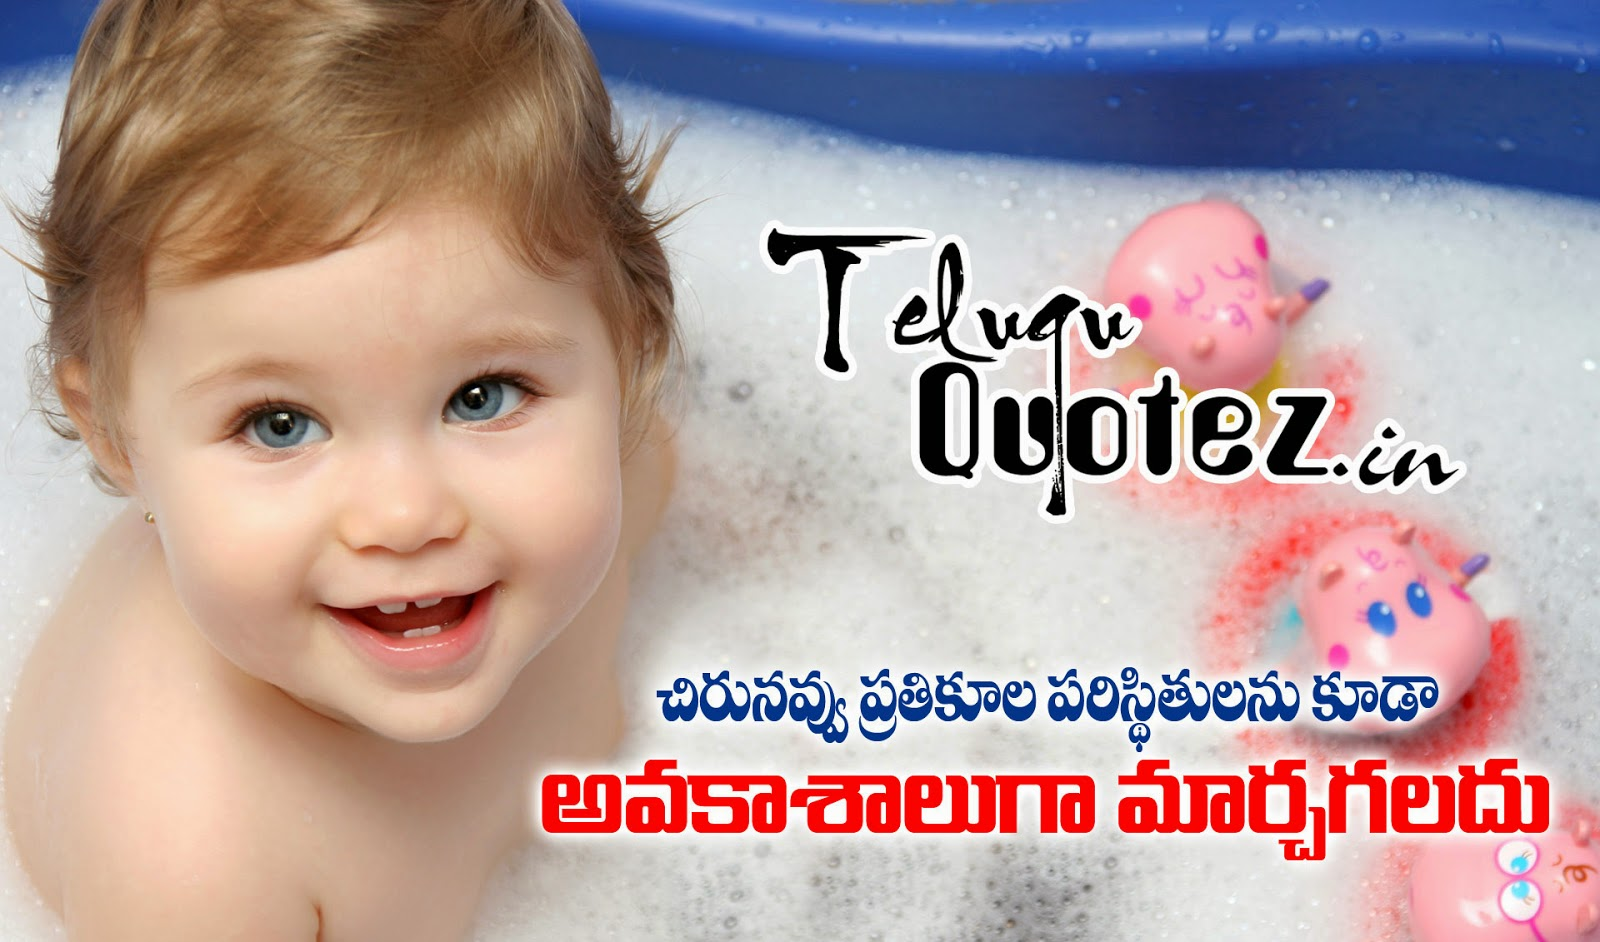 quotations on smile in telugu - photo #9